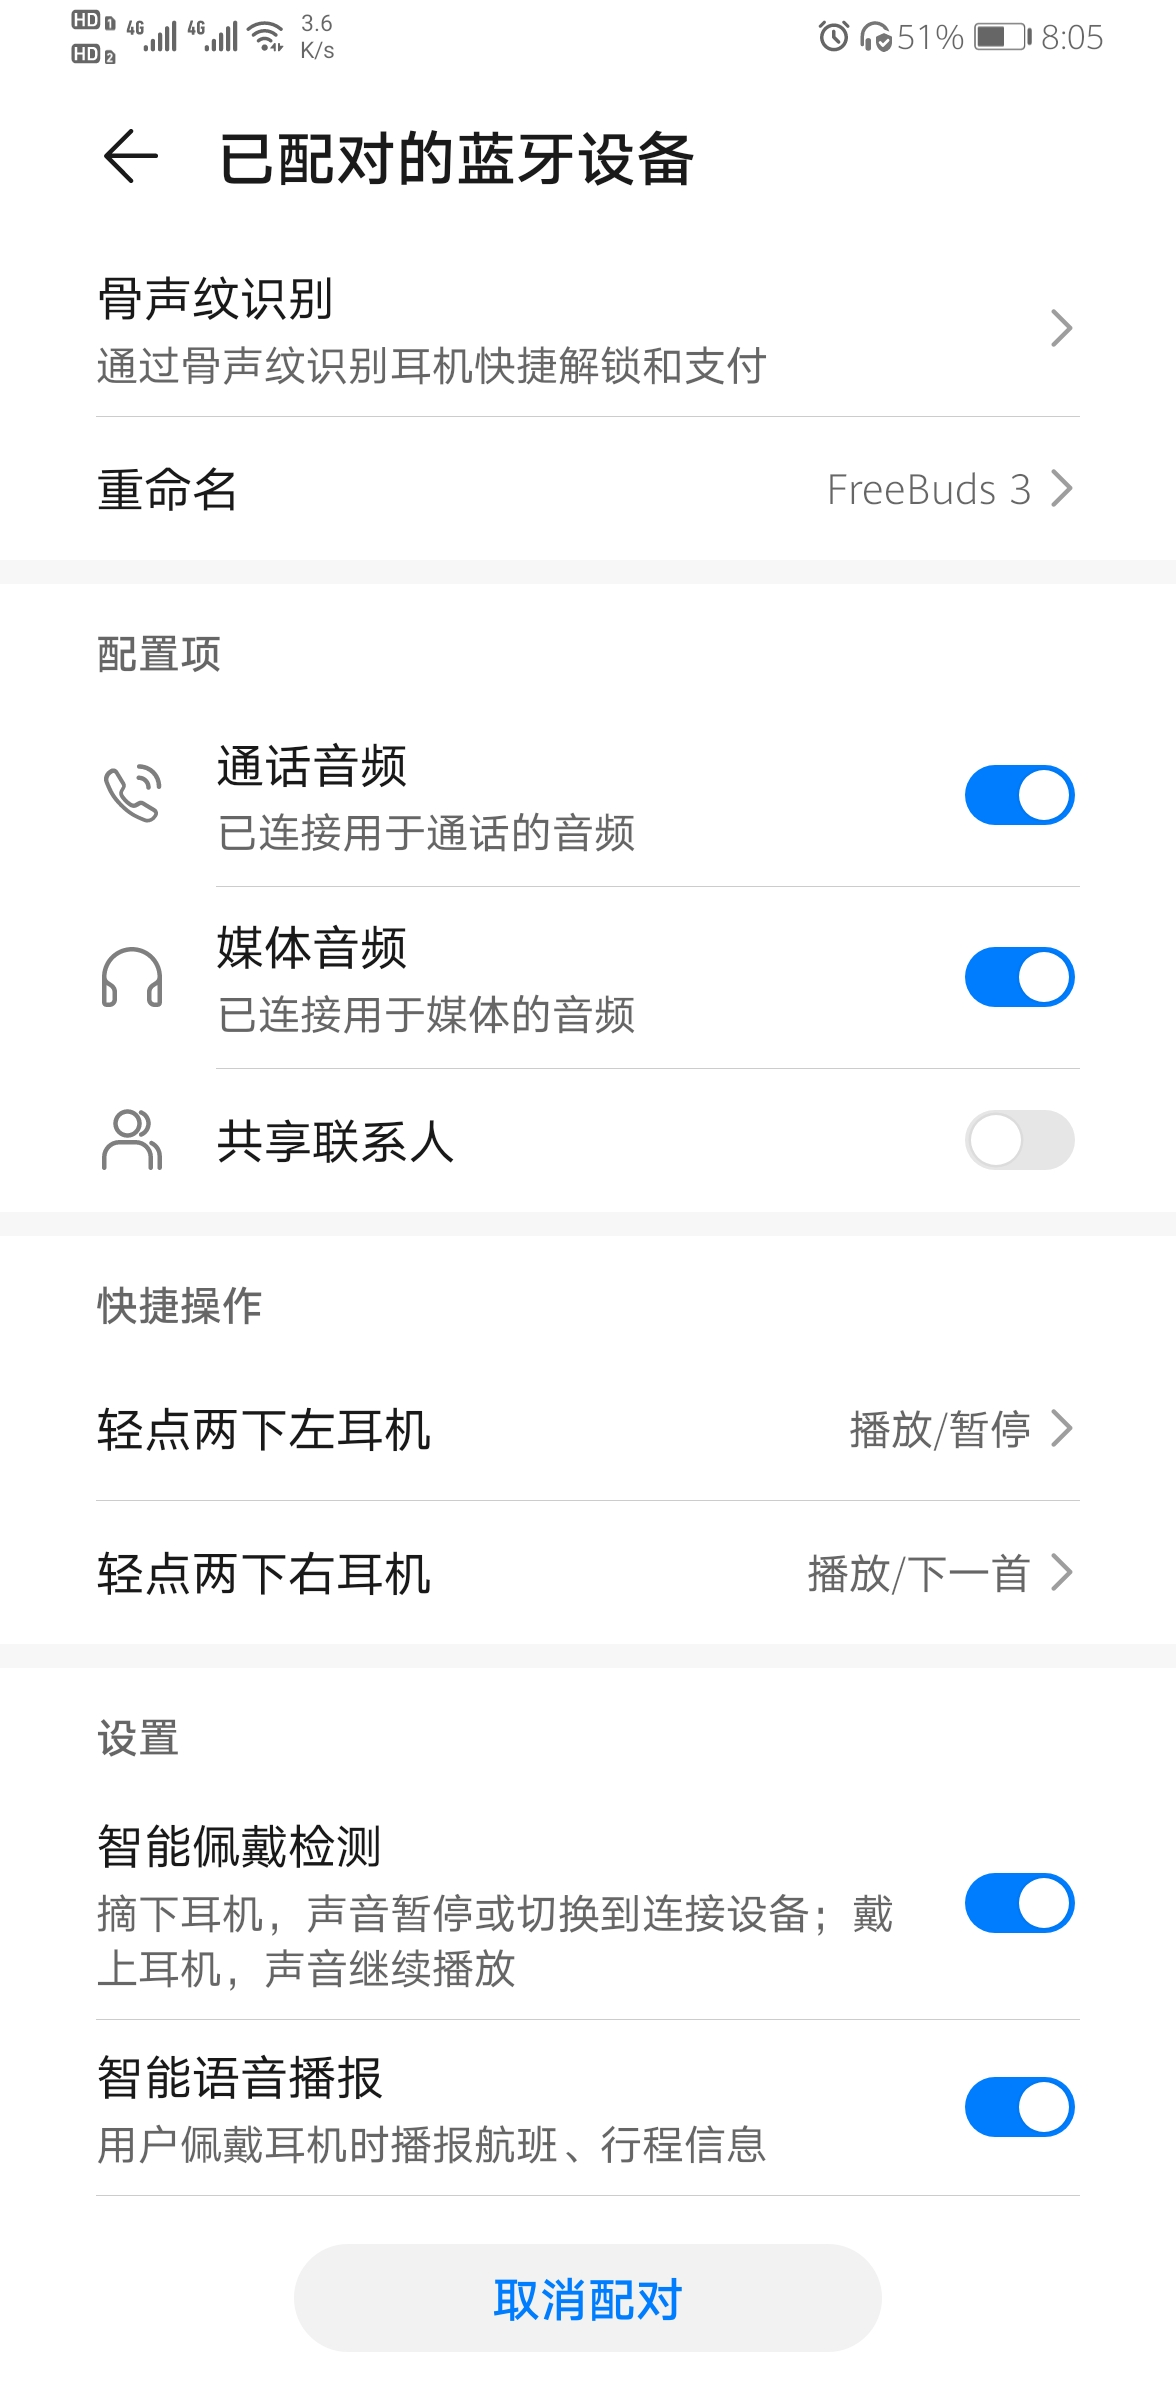 Screenshot_20200415_080545_com.android.settings.jpg